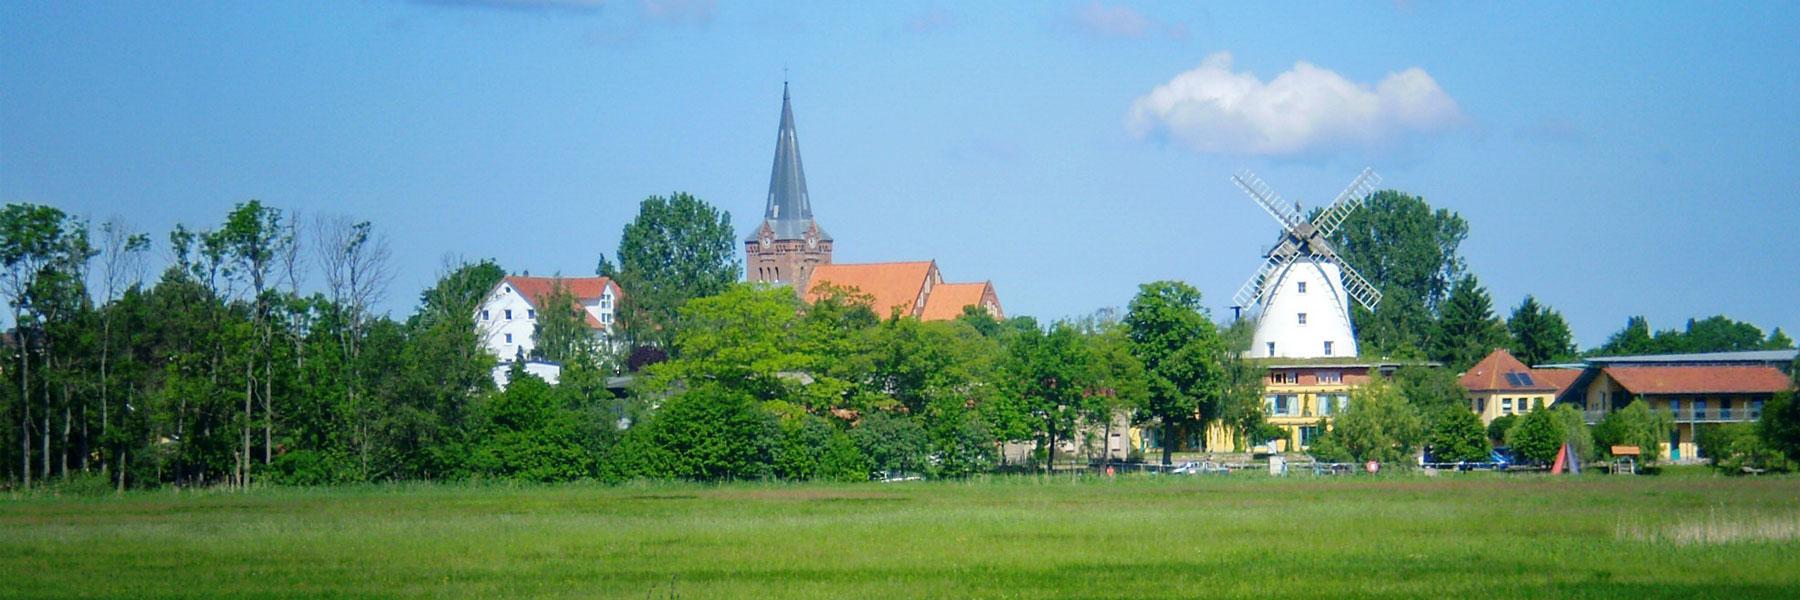 Stadtansicht - Stadt Bad Sülze